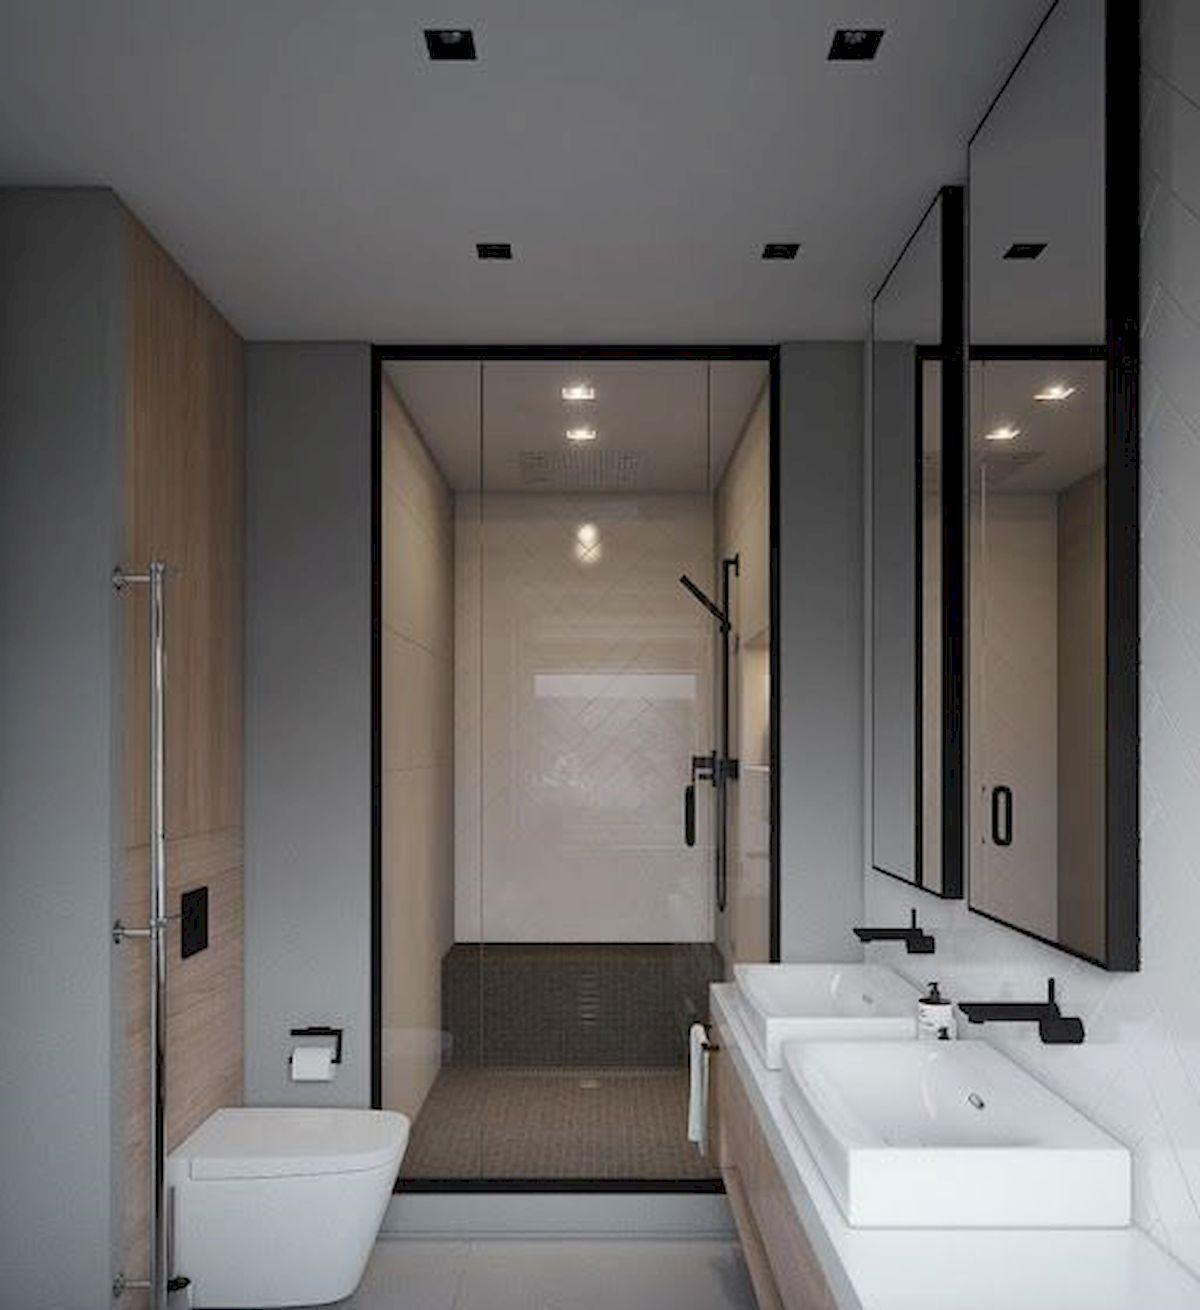 70 Suprising Small Bathroom Design Ideas And Decor Kleine Badezimmer Design Badezimmer Klein Badezimmer Innenausstattung